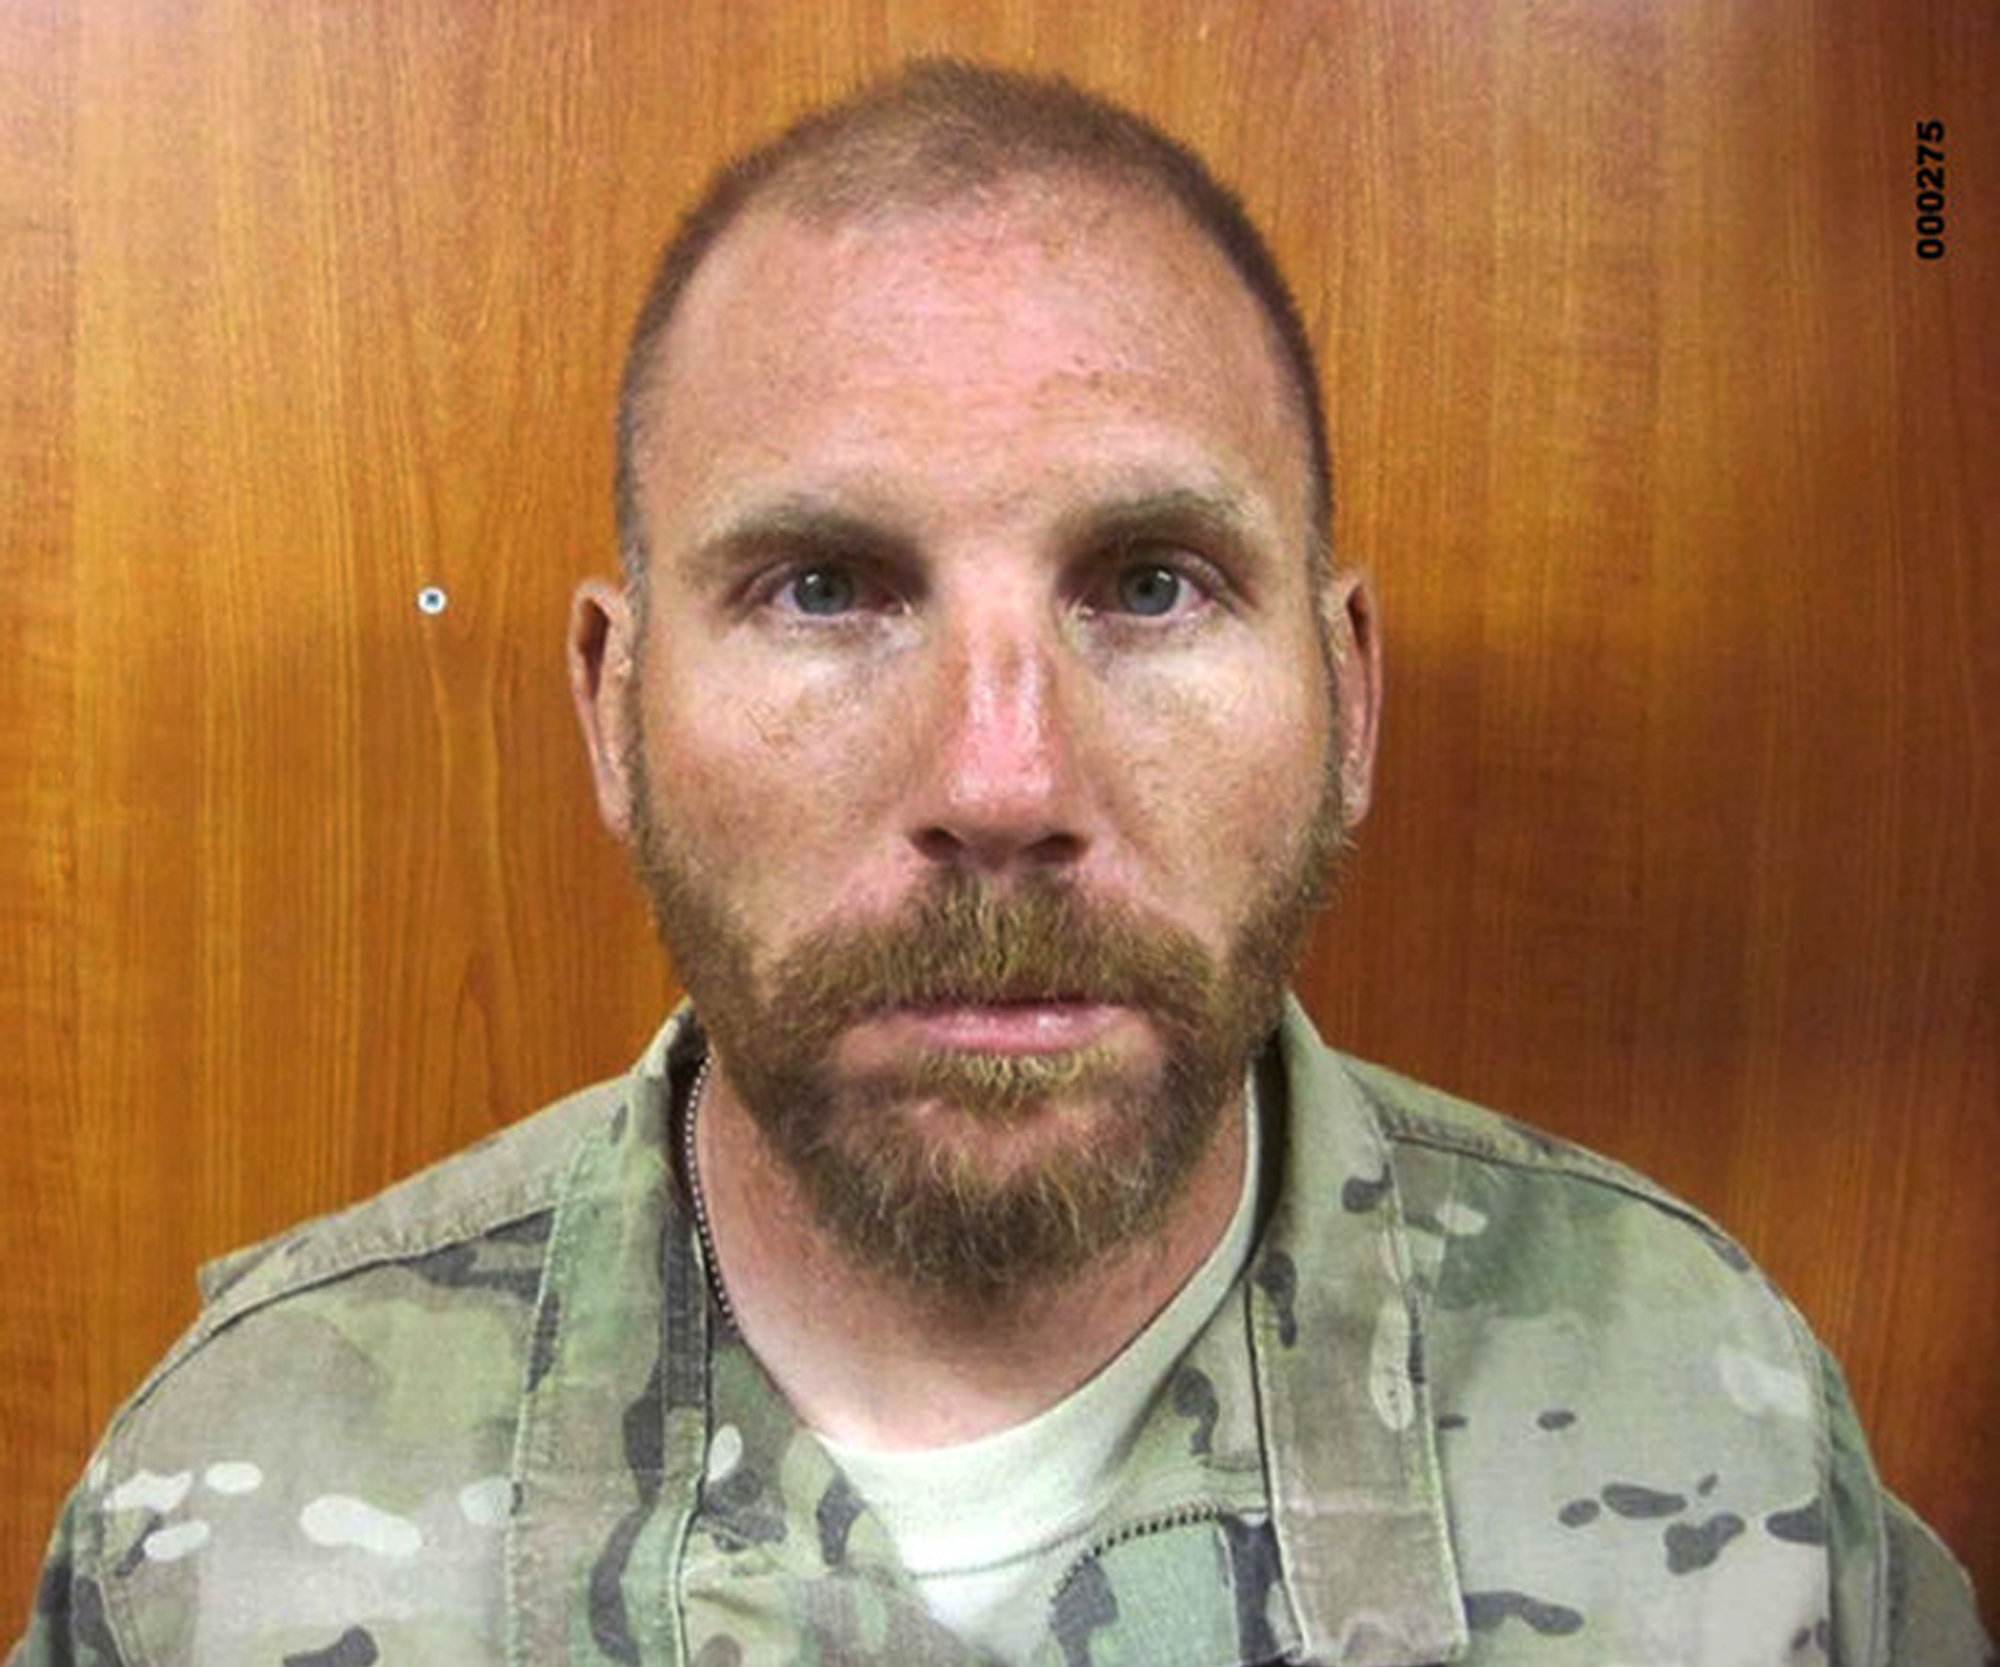 Robert Bales  mató a balazos a 16 personas en el distrito de Panjwai (Afganistán)